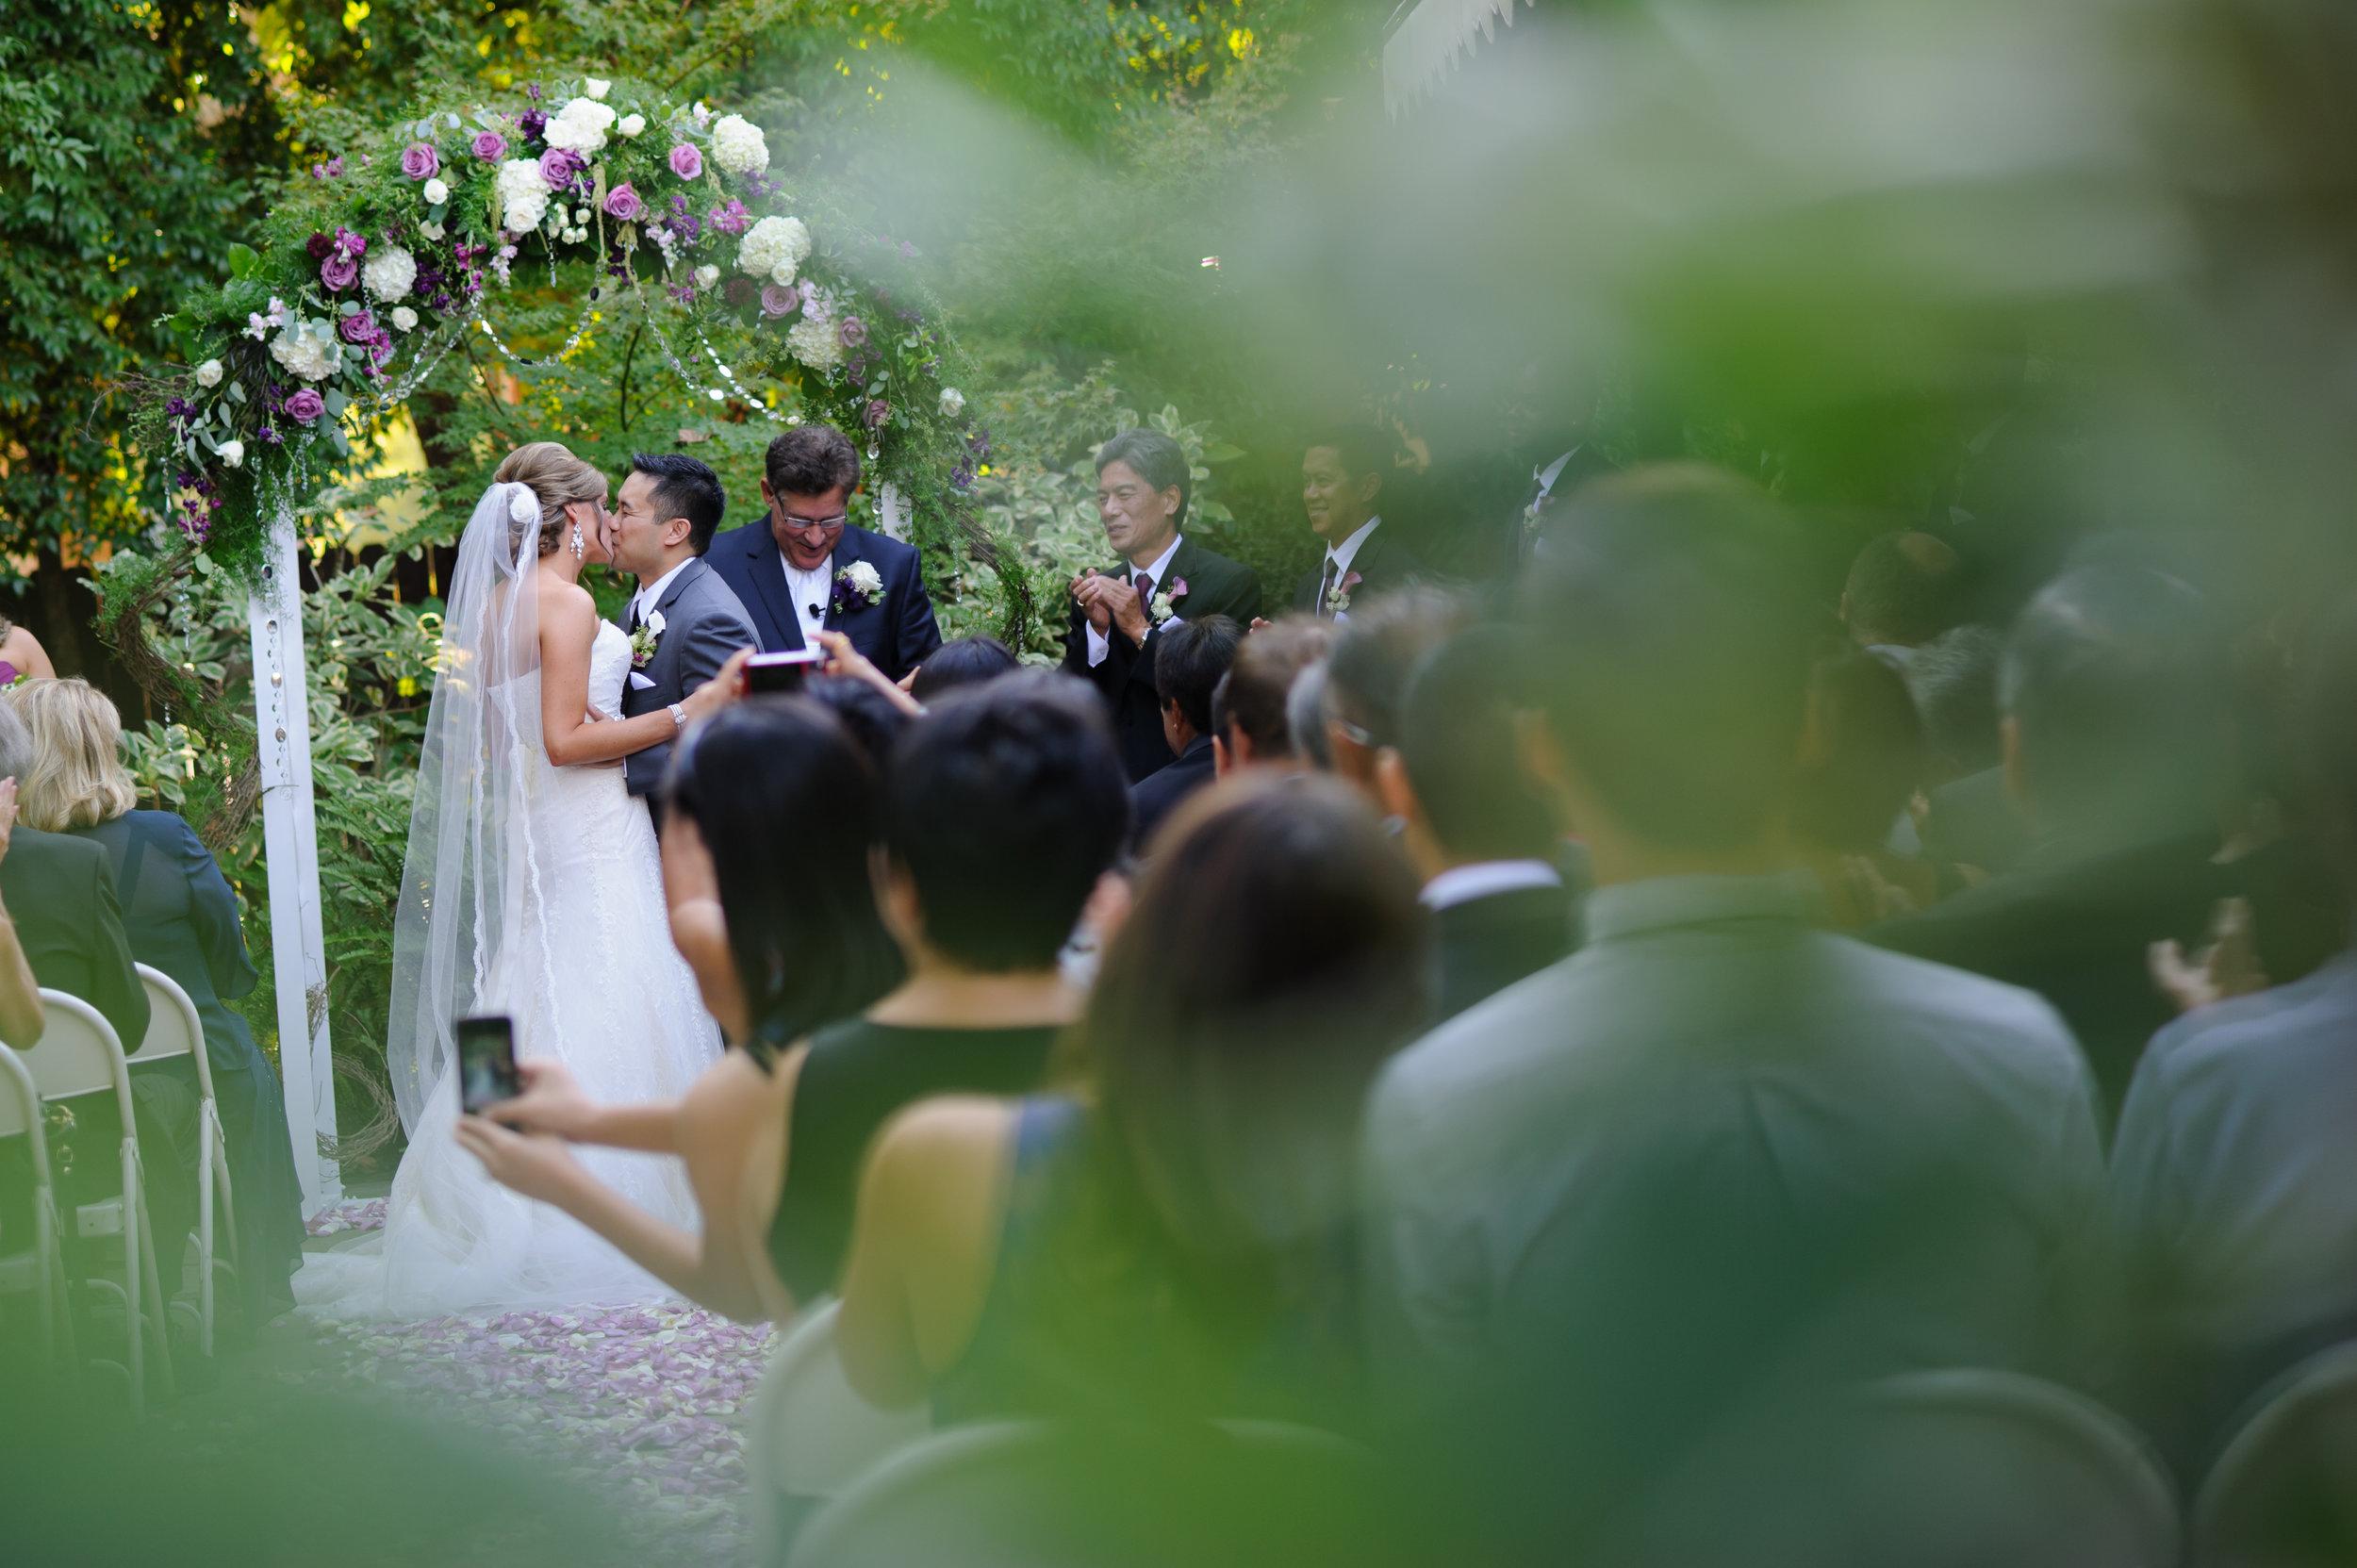 susan-brad-019-sacramento-wedding-photographer-katherine-nicole-photography.JPG